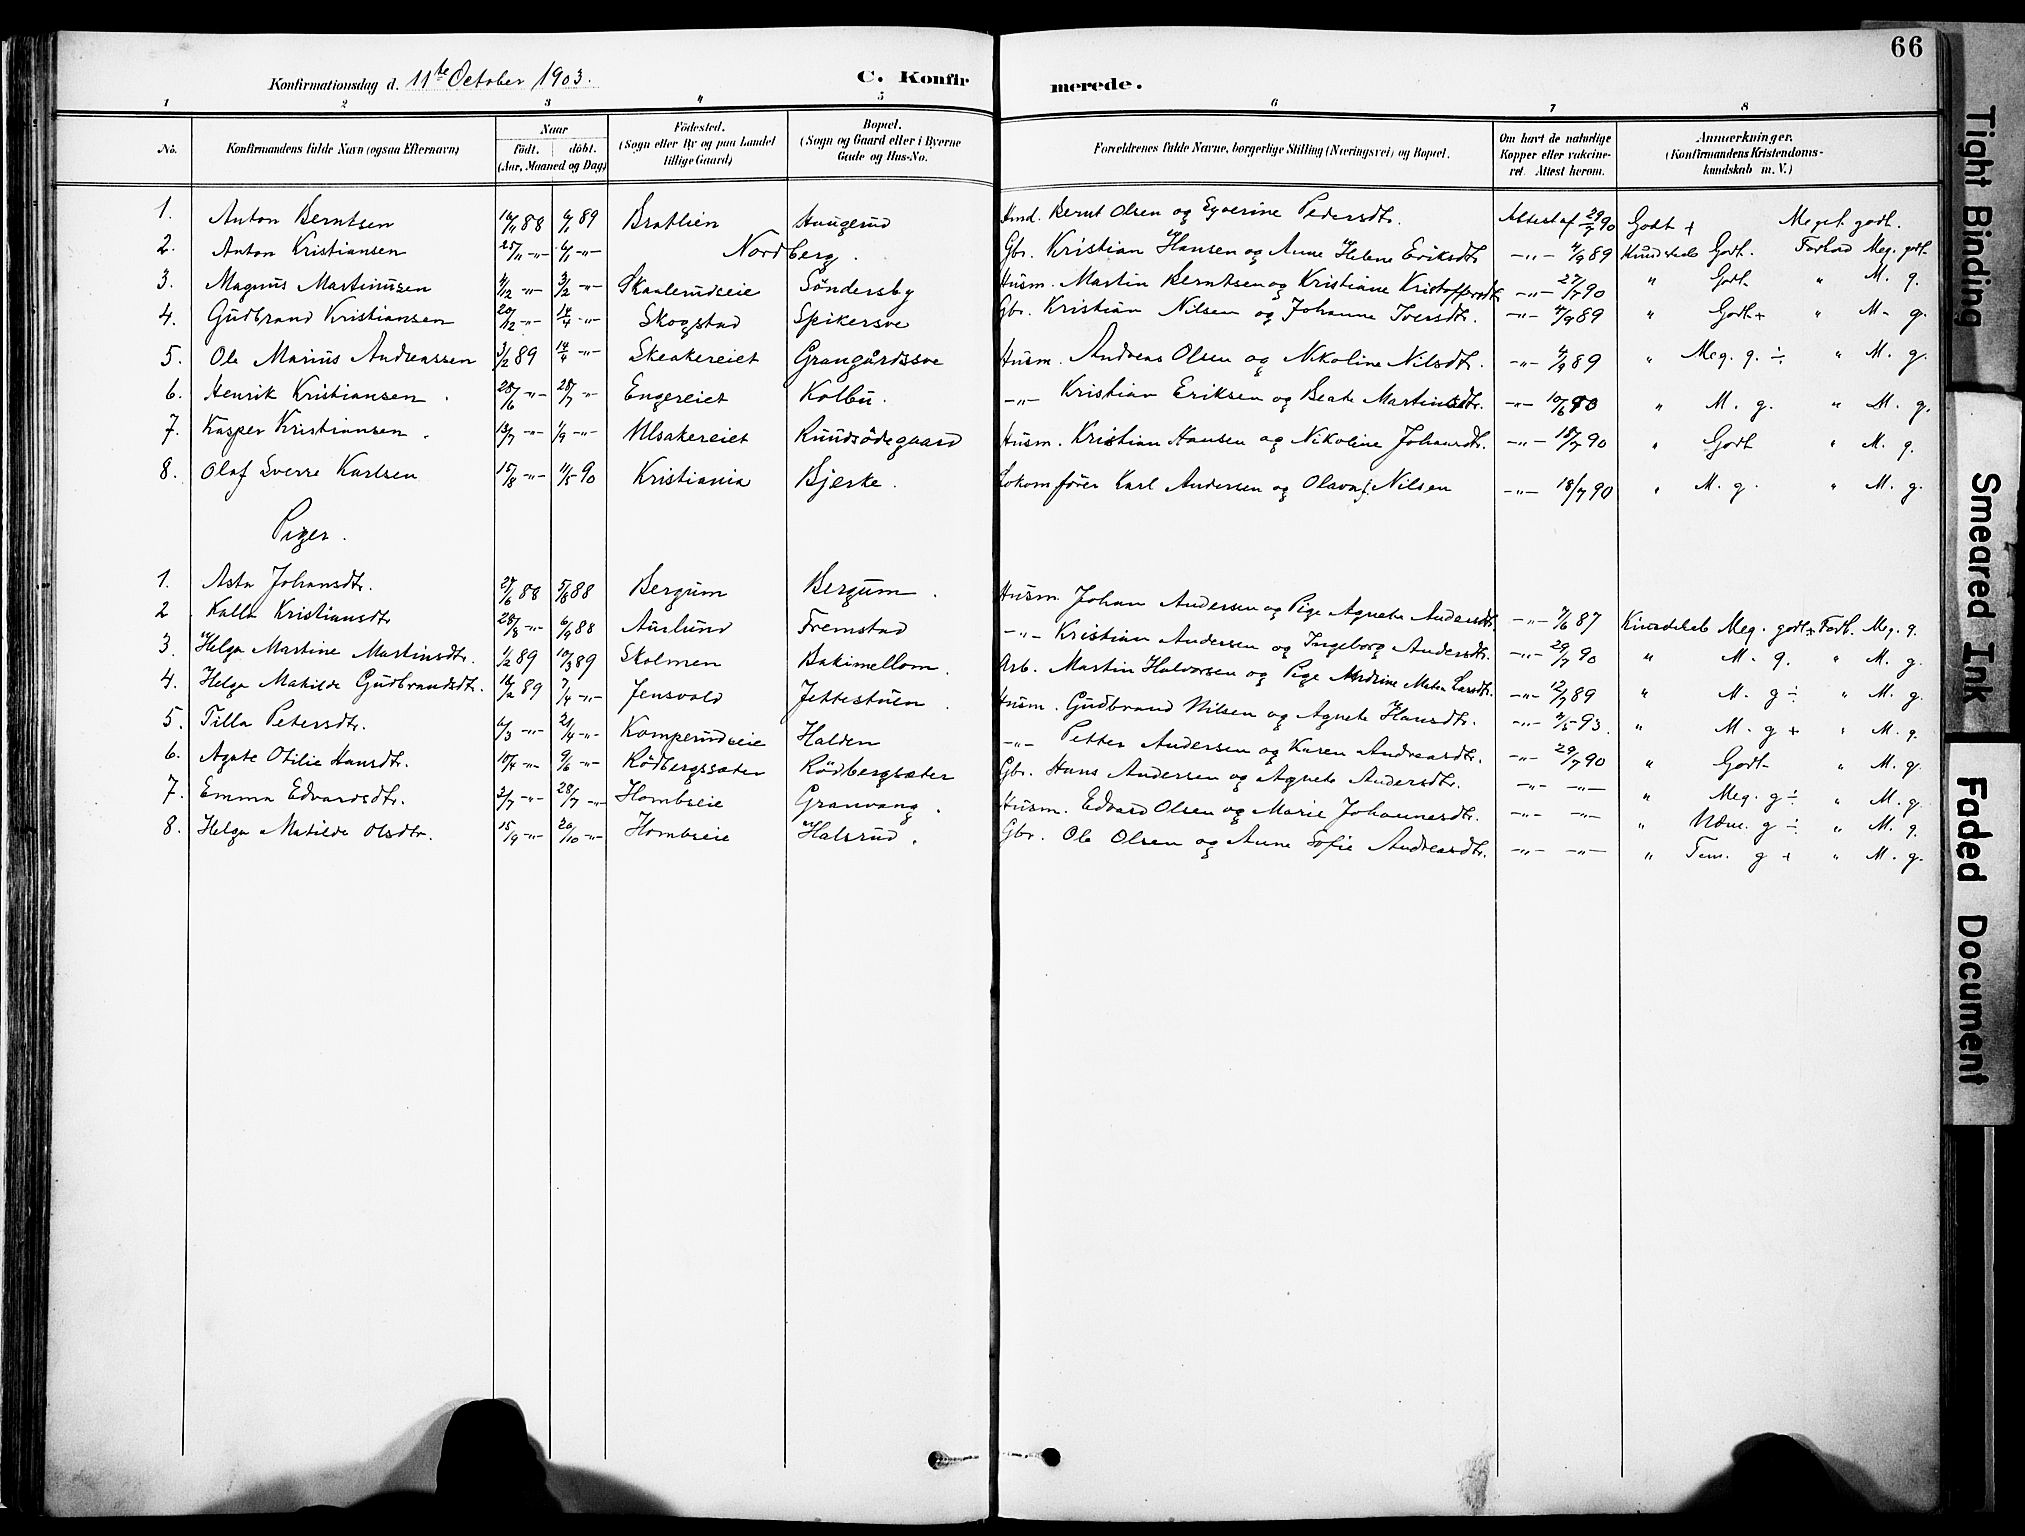 SAH, Nordre Land prestekontor, Ministerialbok nr. 6, 1897-1914, s. 66